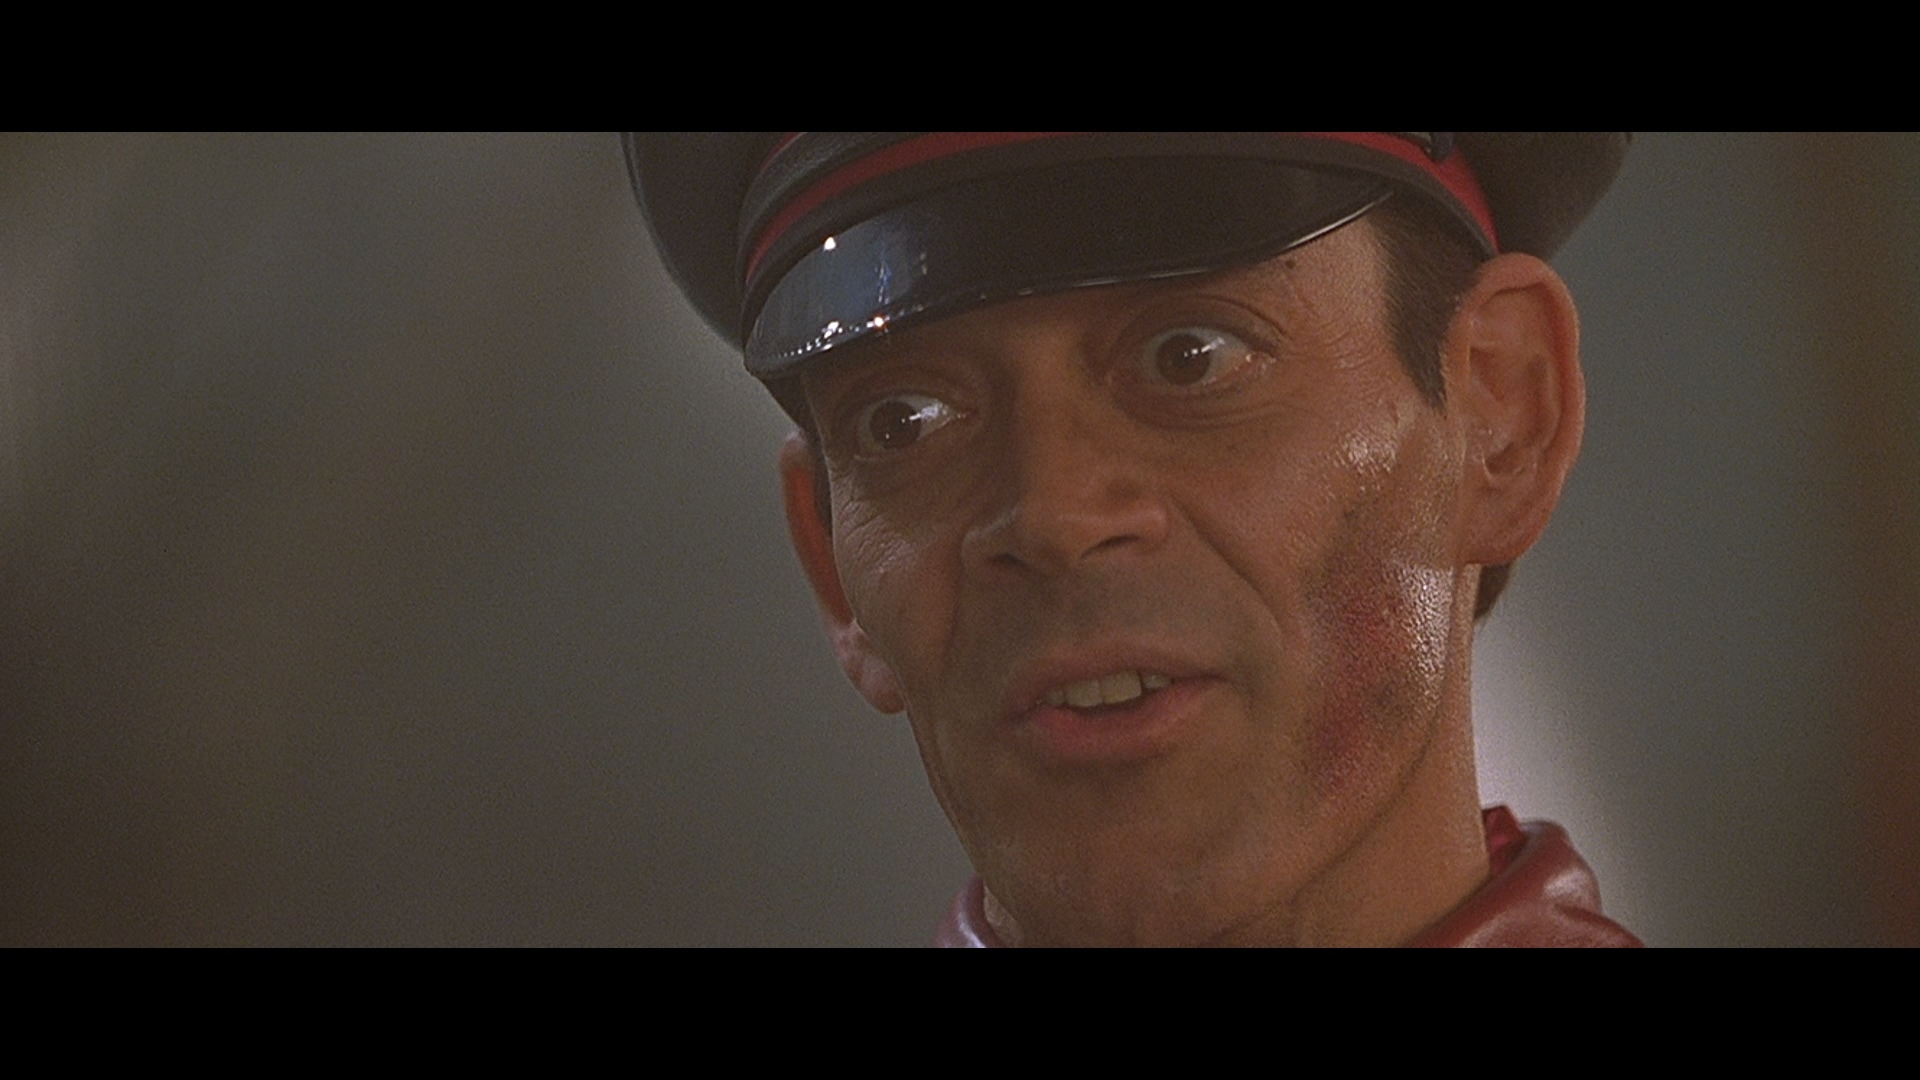 More Jean Claude Van Damme Wallpapers Army 1415652 Hd